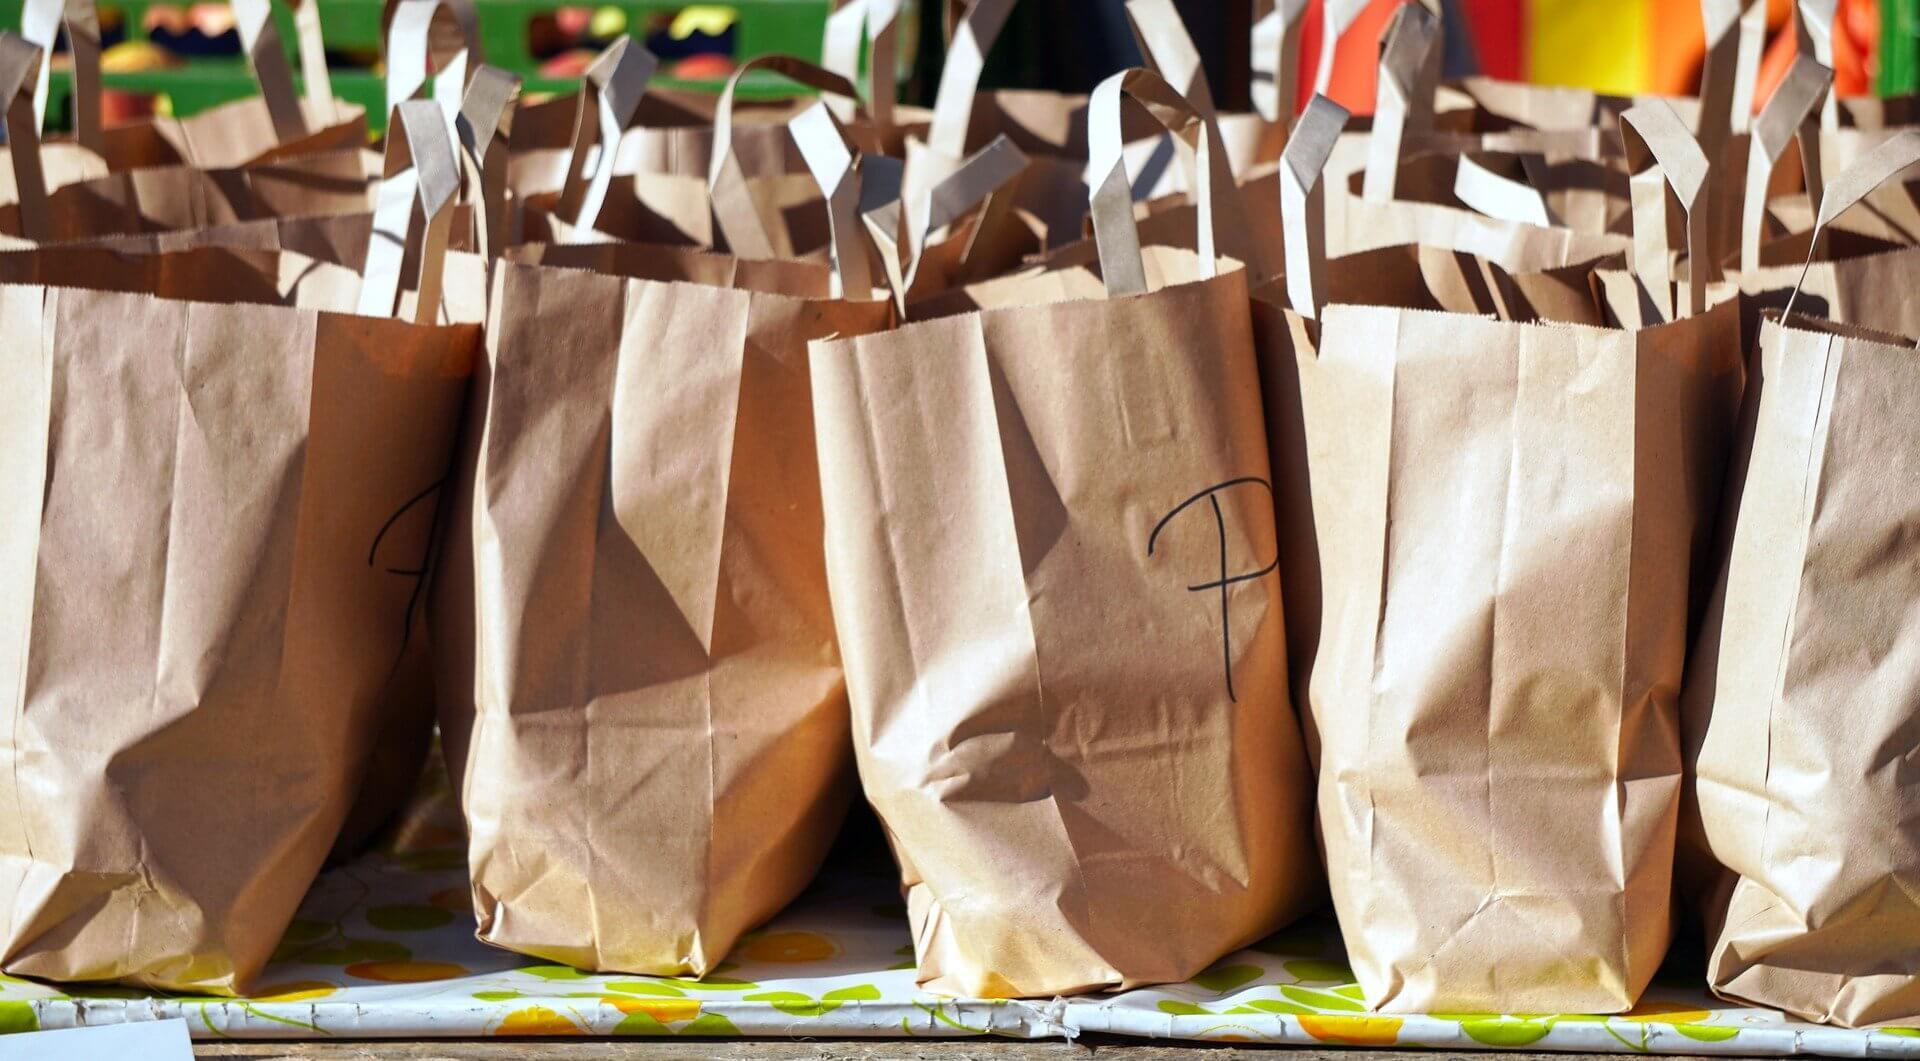 bags-4543999_1920 (1) (1)